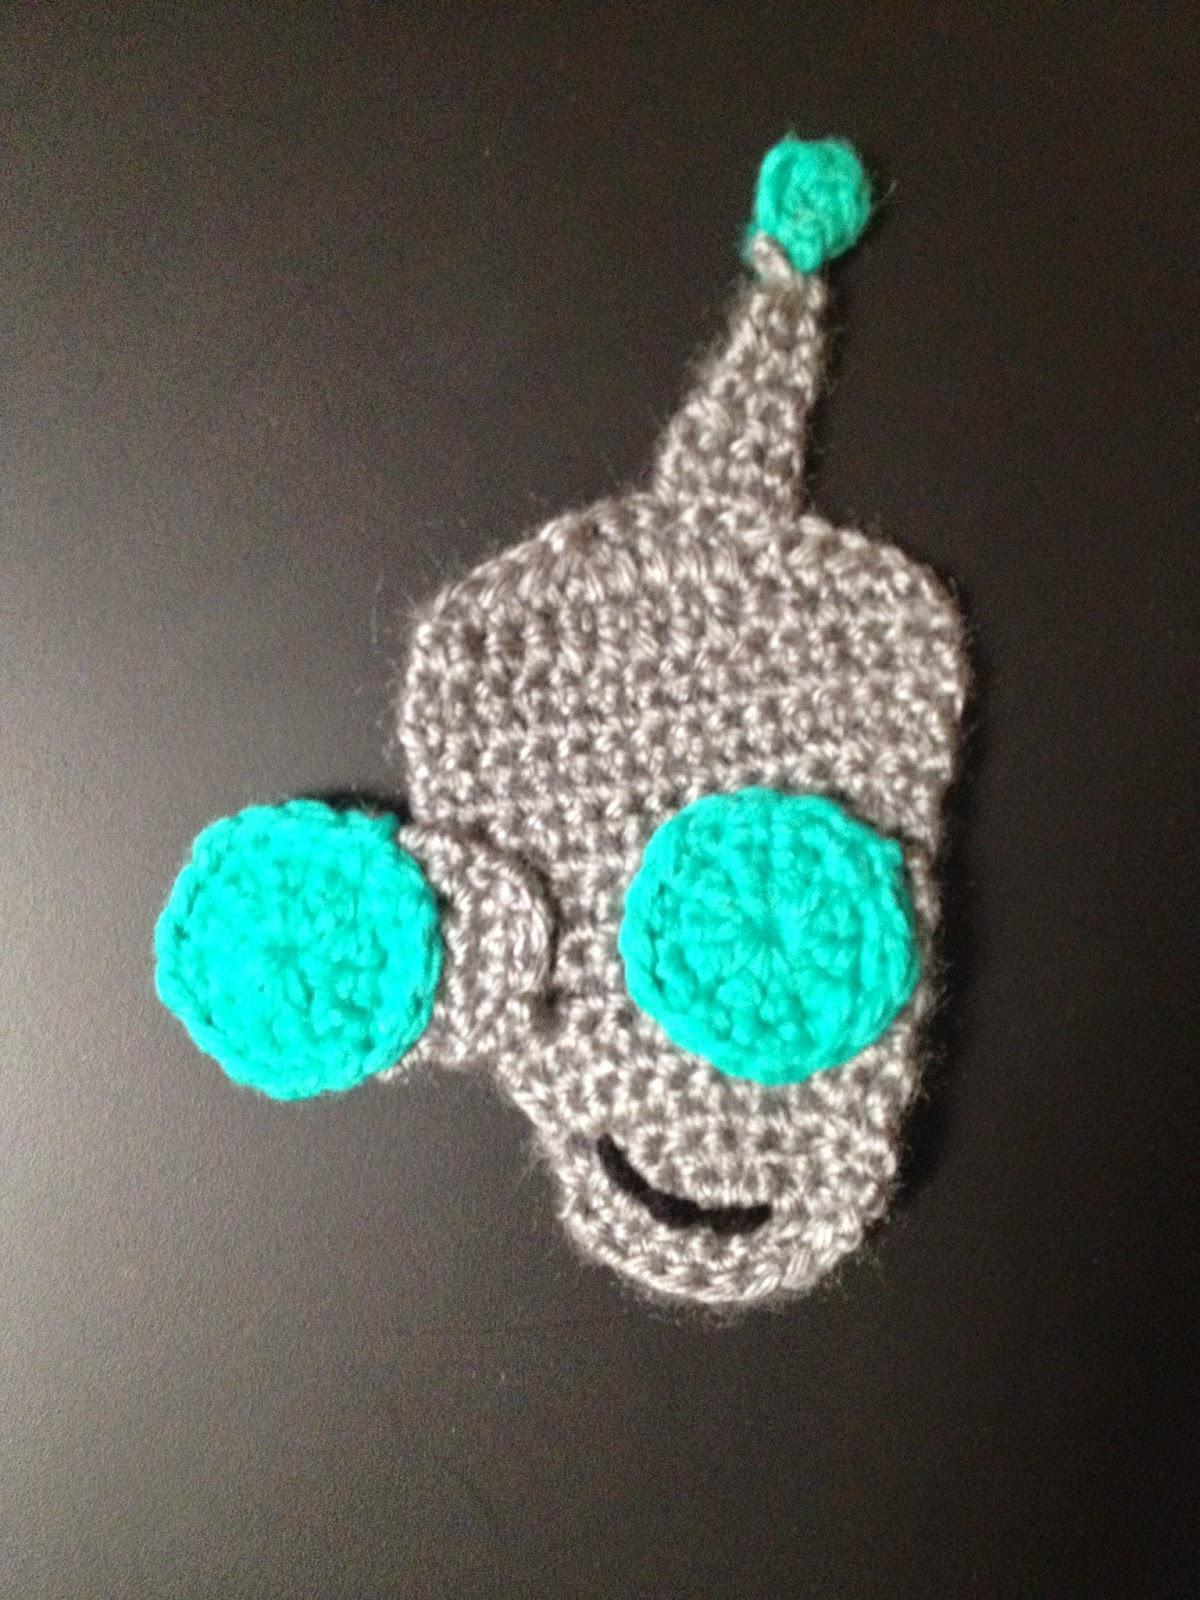 Crochet Kooky Robot Applique ~ Manda Proell - MandaLynn's Crochet Treasures